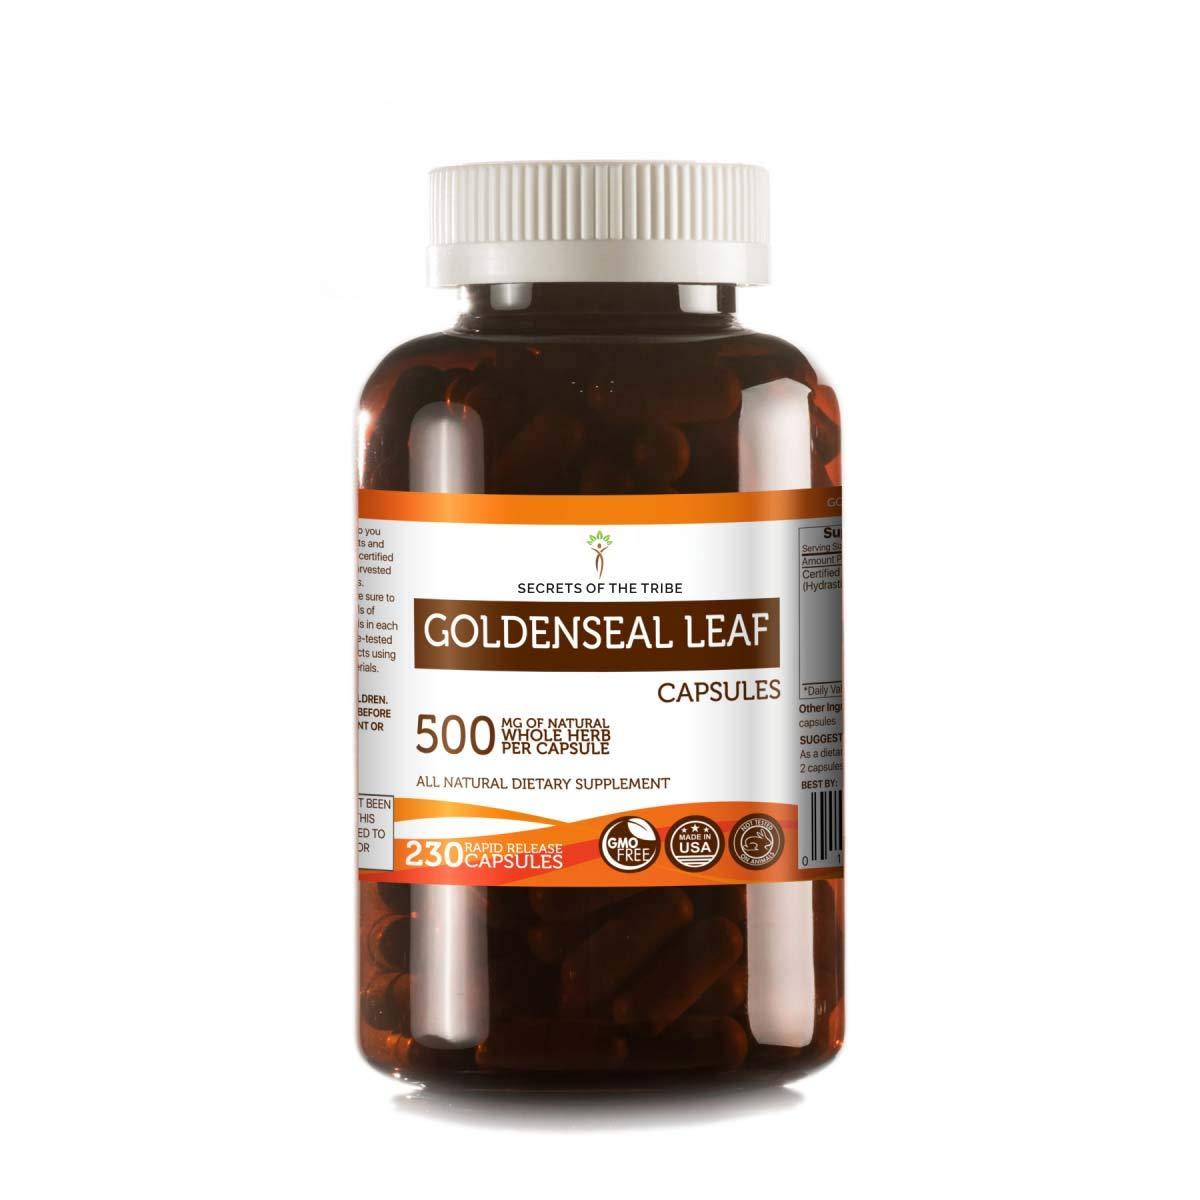 Goldenseal Leaf 230 Capsules, 500 mg, Organic Goldenseal Leaf (Hydrastis Canadensis) Dried Leaf (230 Capsules)